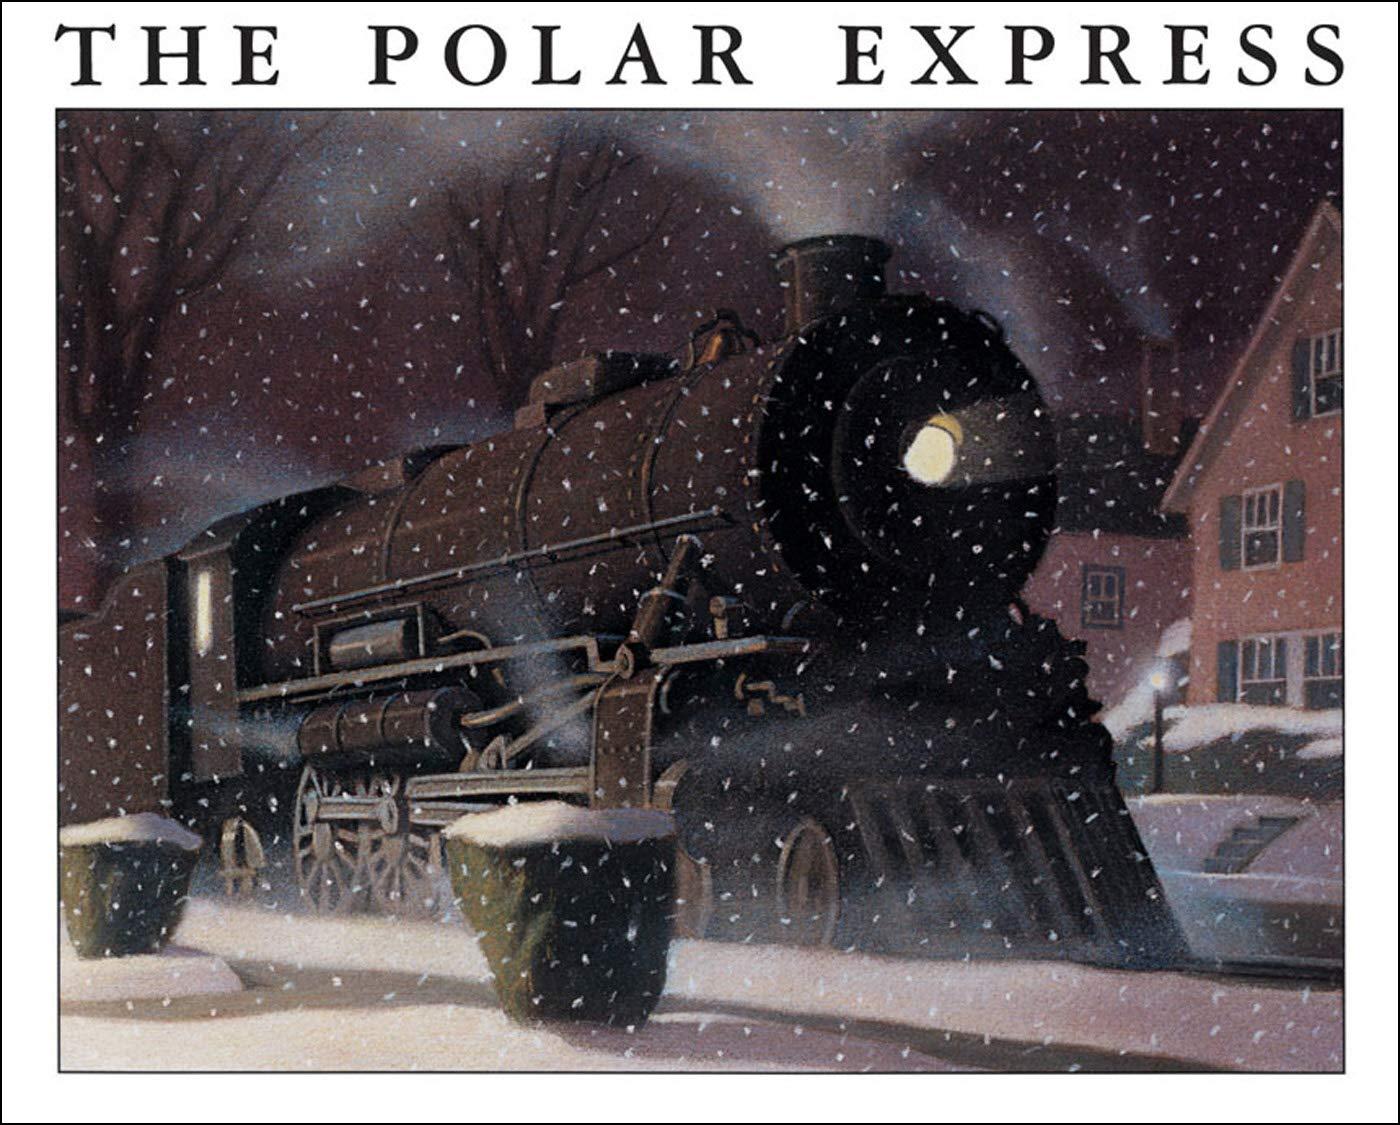 01a4ec3c67 The Polar Express: Mini Edition: Amazon.co.uk: Chris Van Allsburg: Books